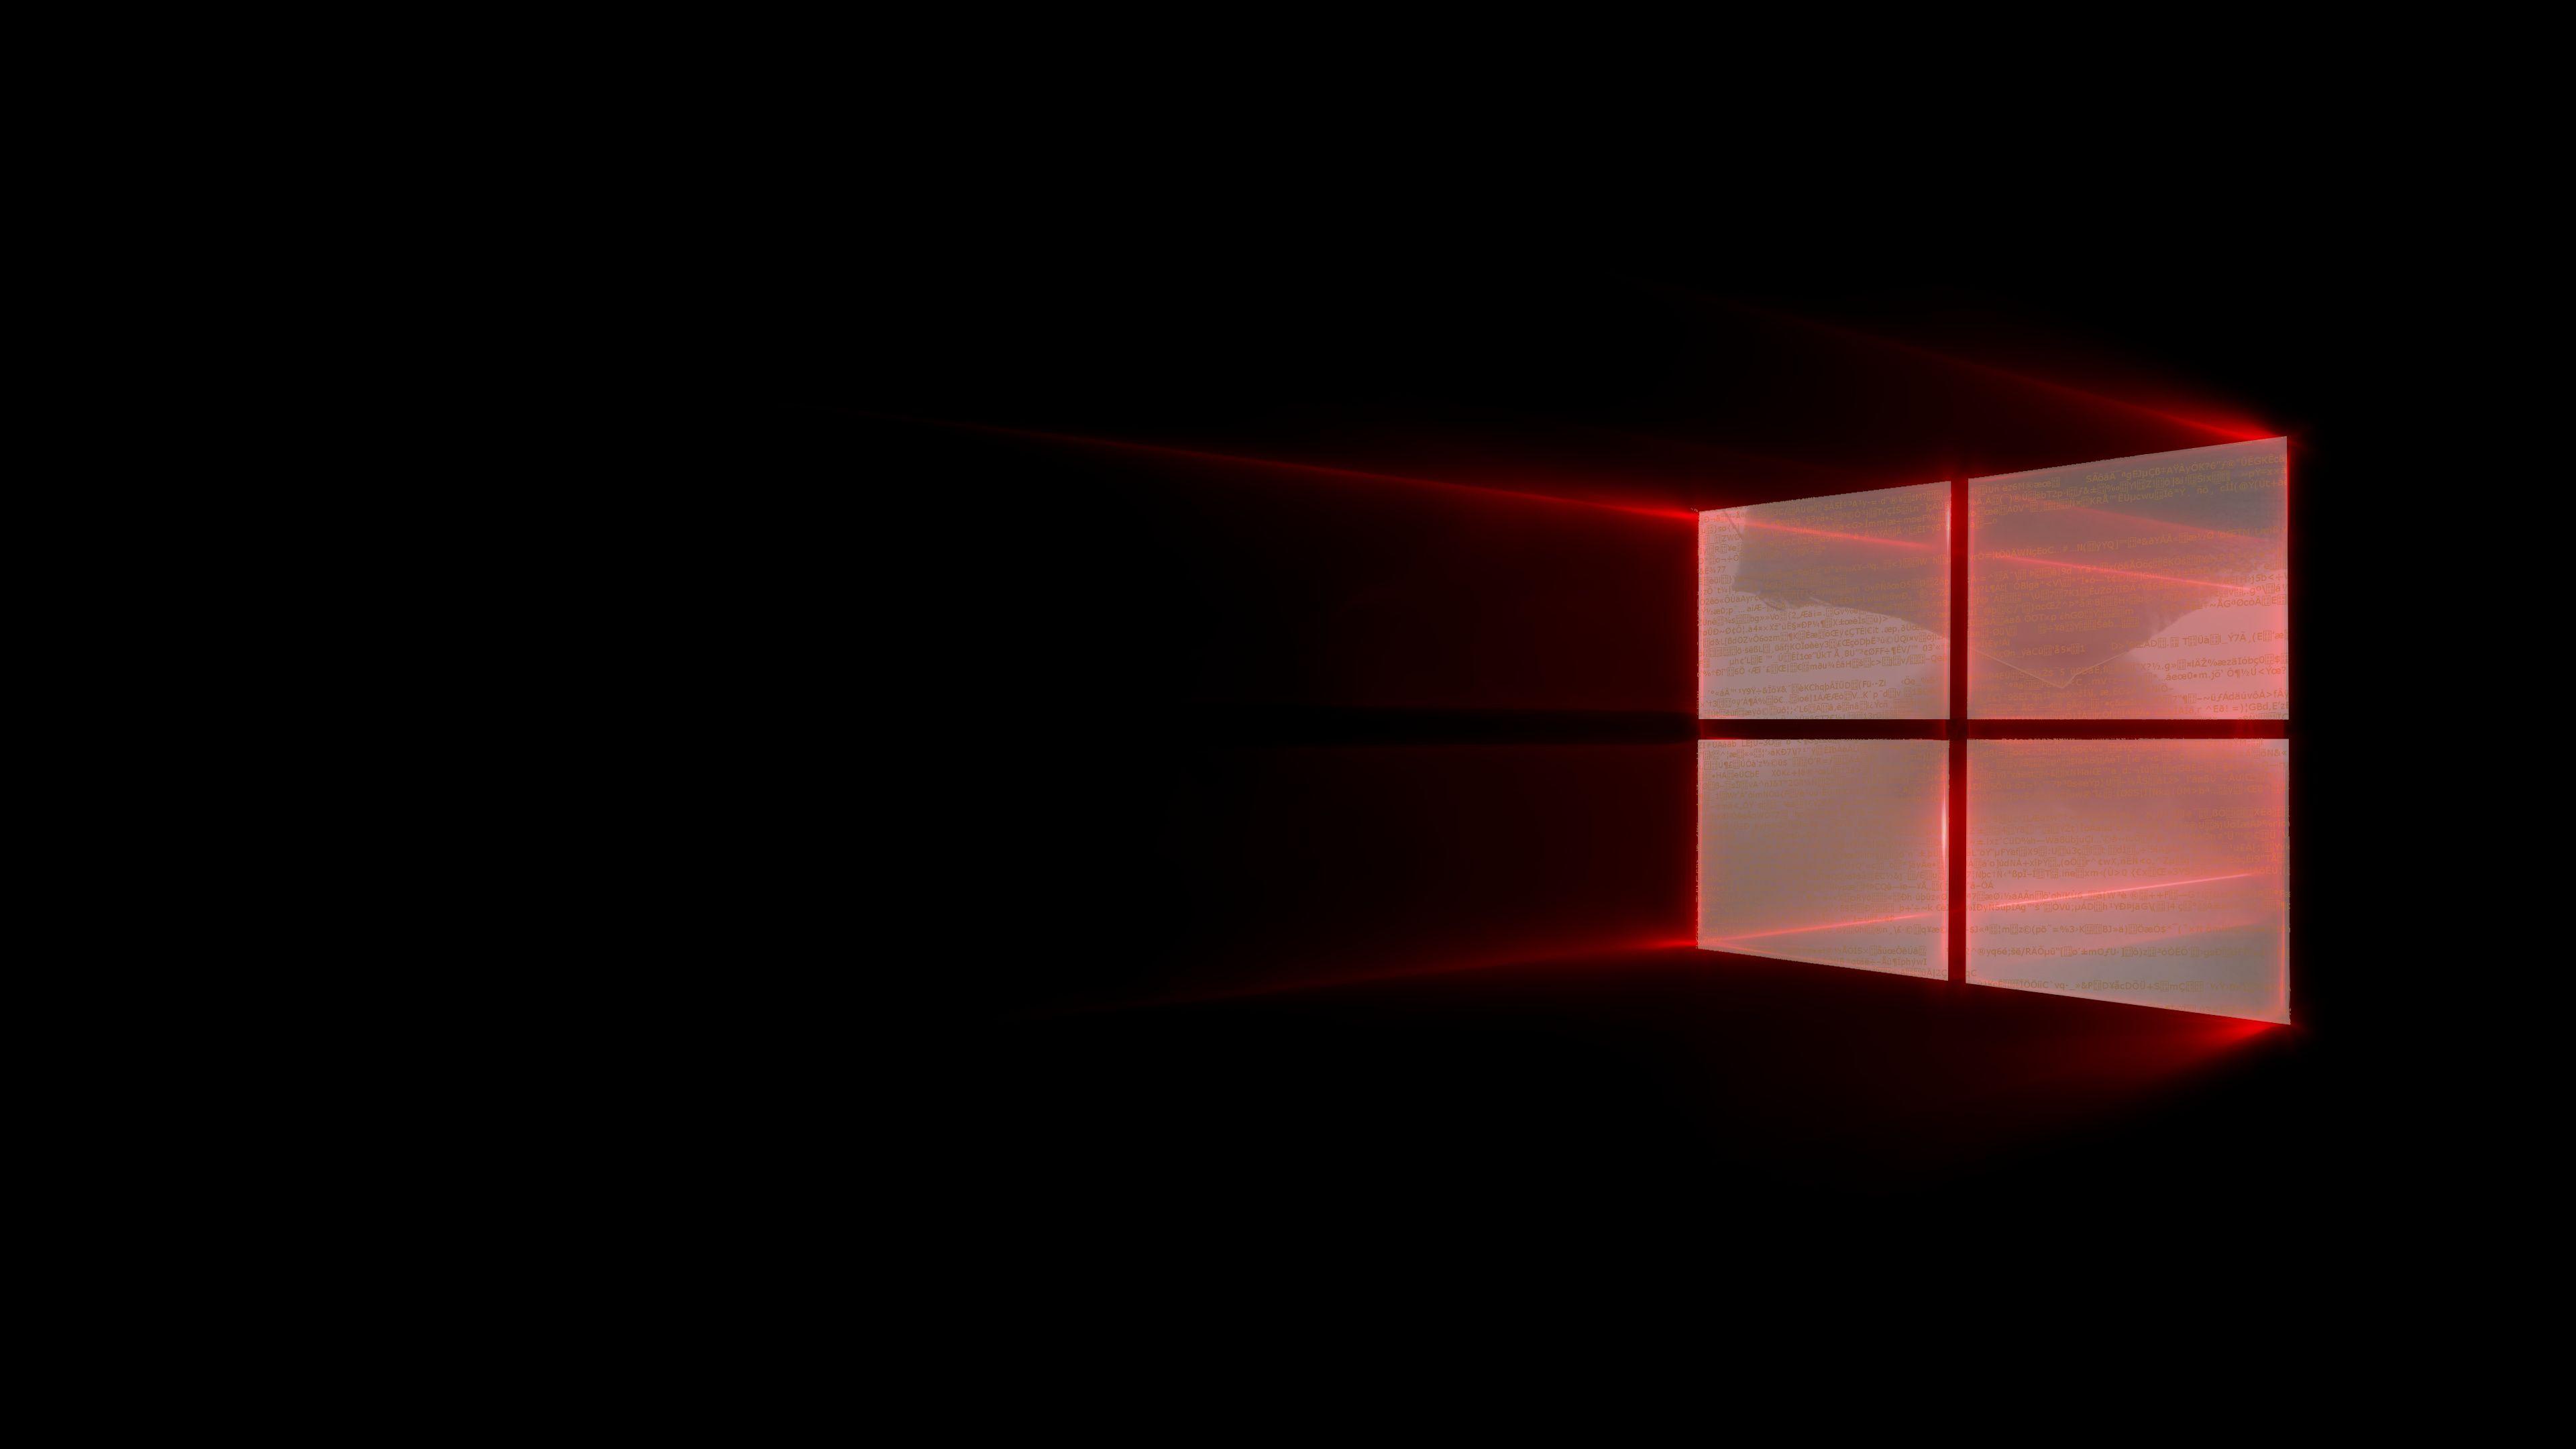 Windows 10 Desktop Background Windows 10 Desktop Backgrounds Windows Wallpaper Wallpaper Windows 10